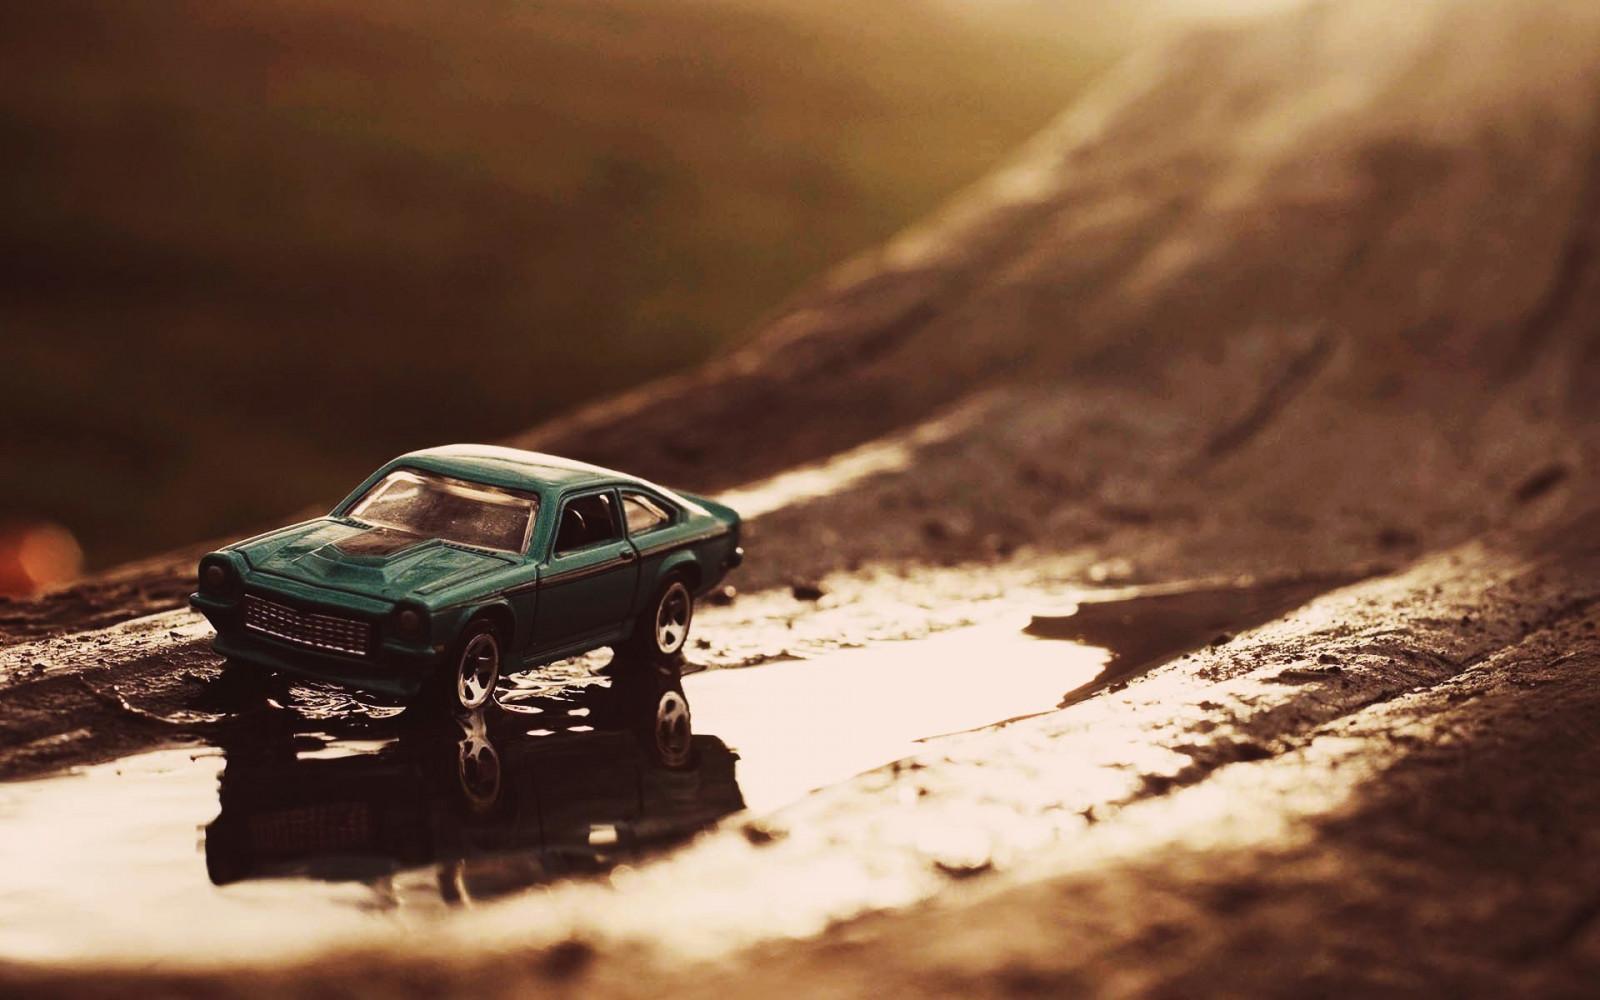 Wallpaper Sunlight Toys Car Reflection Vehicle Wood